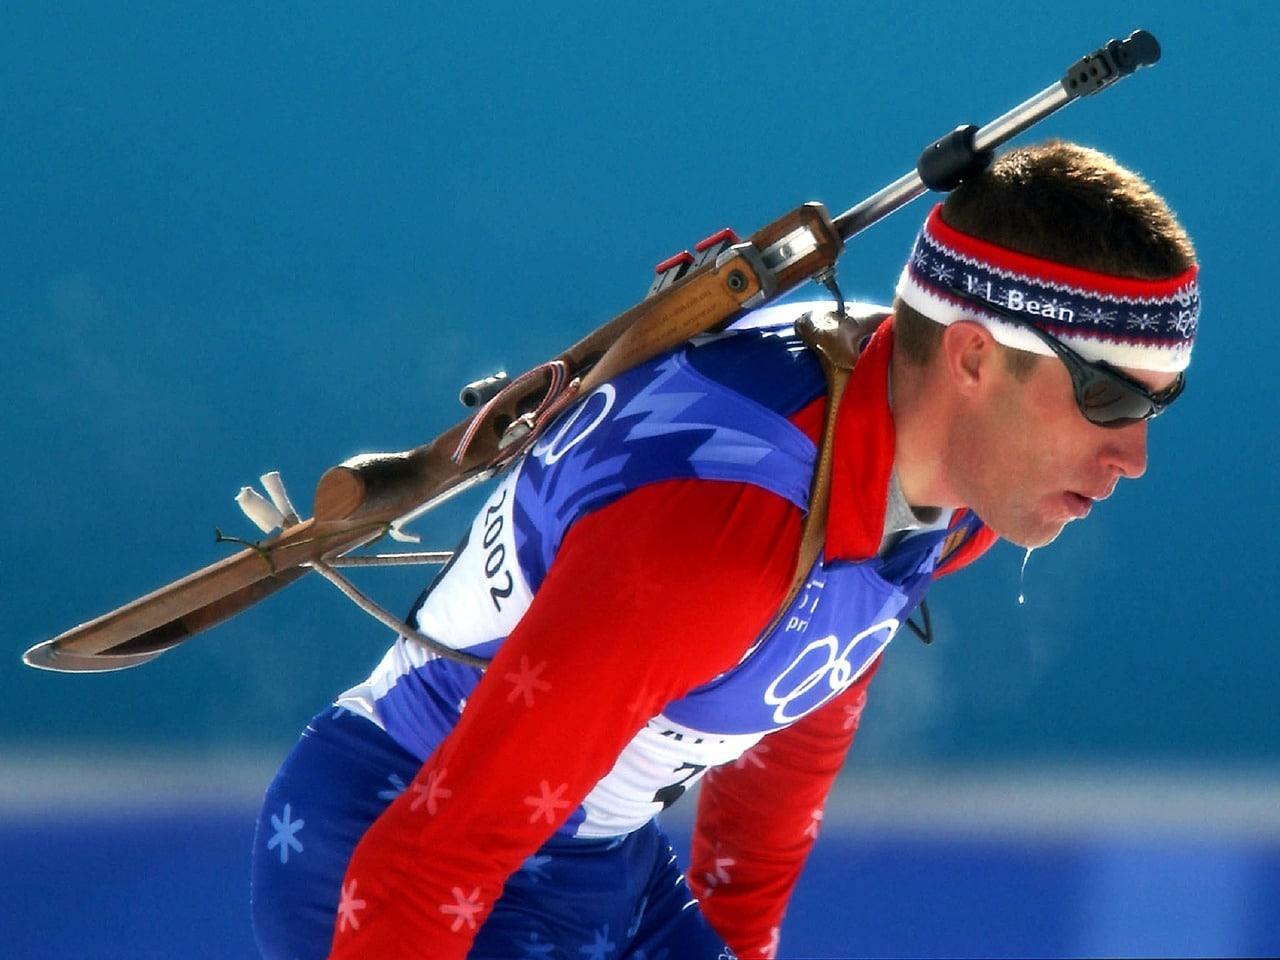 Ukraine Para Biathlon